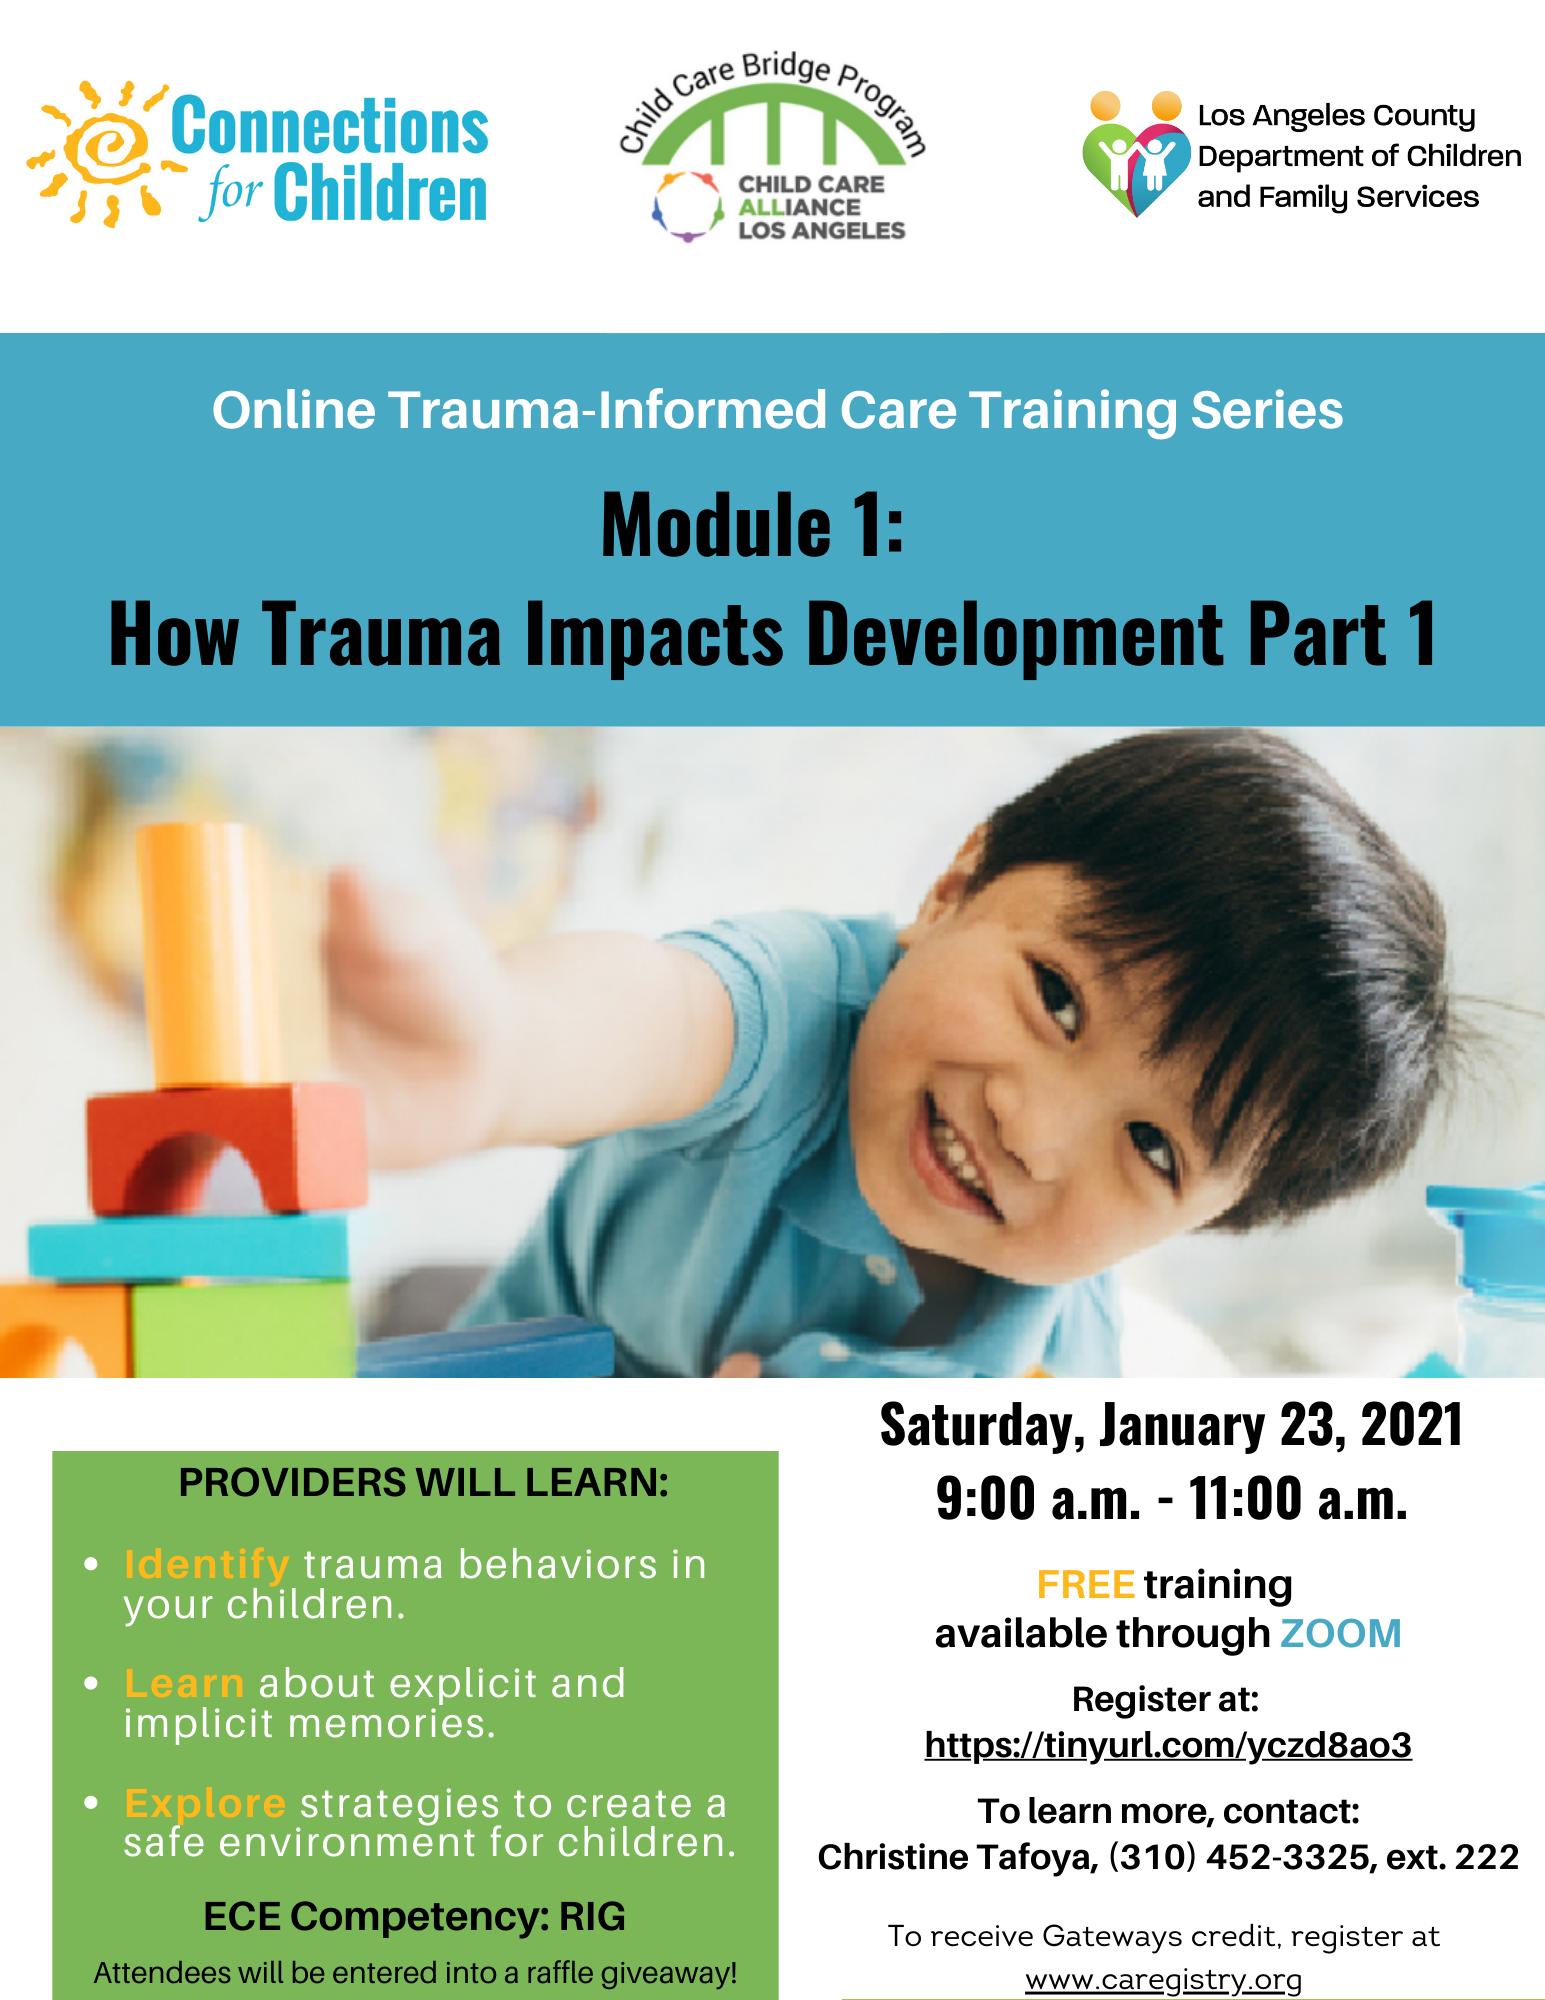 How Trauma Impacts Development, Part 1